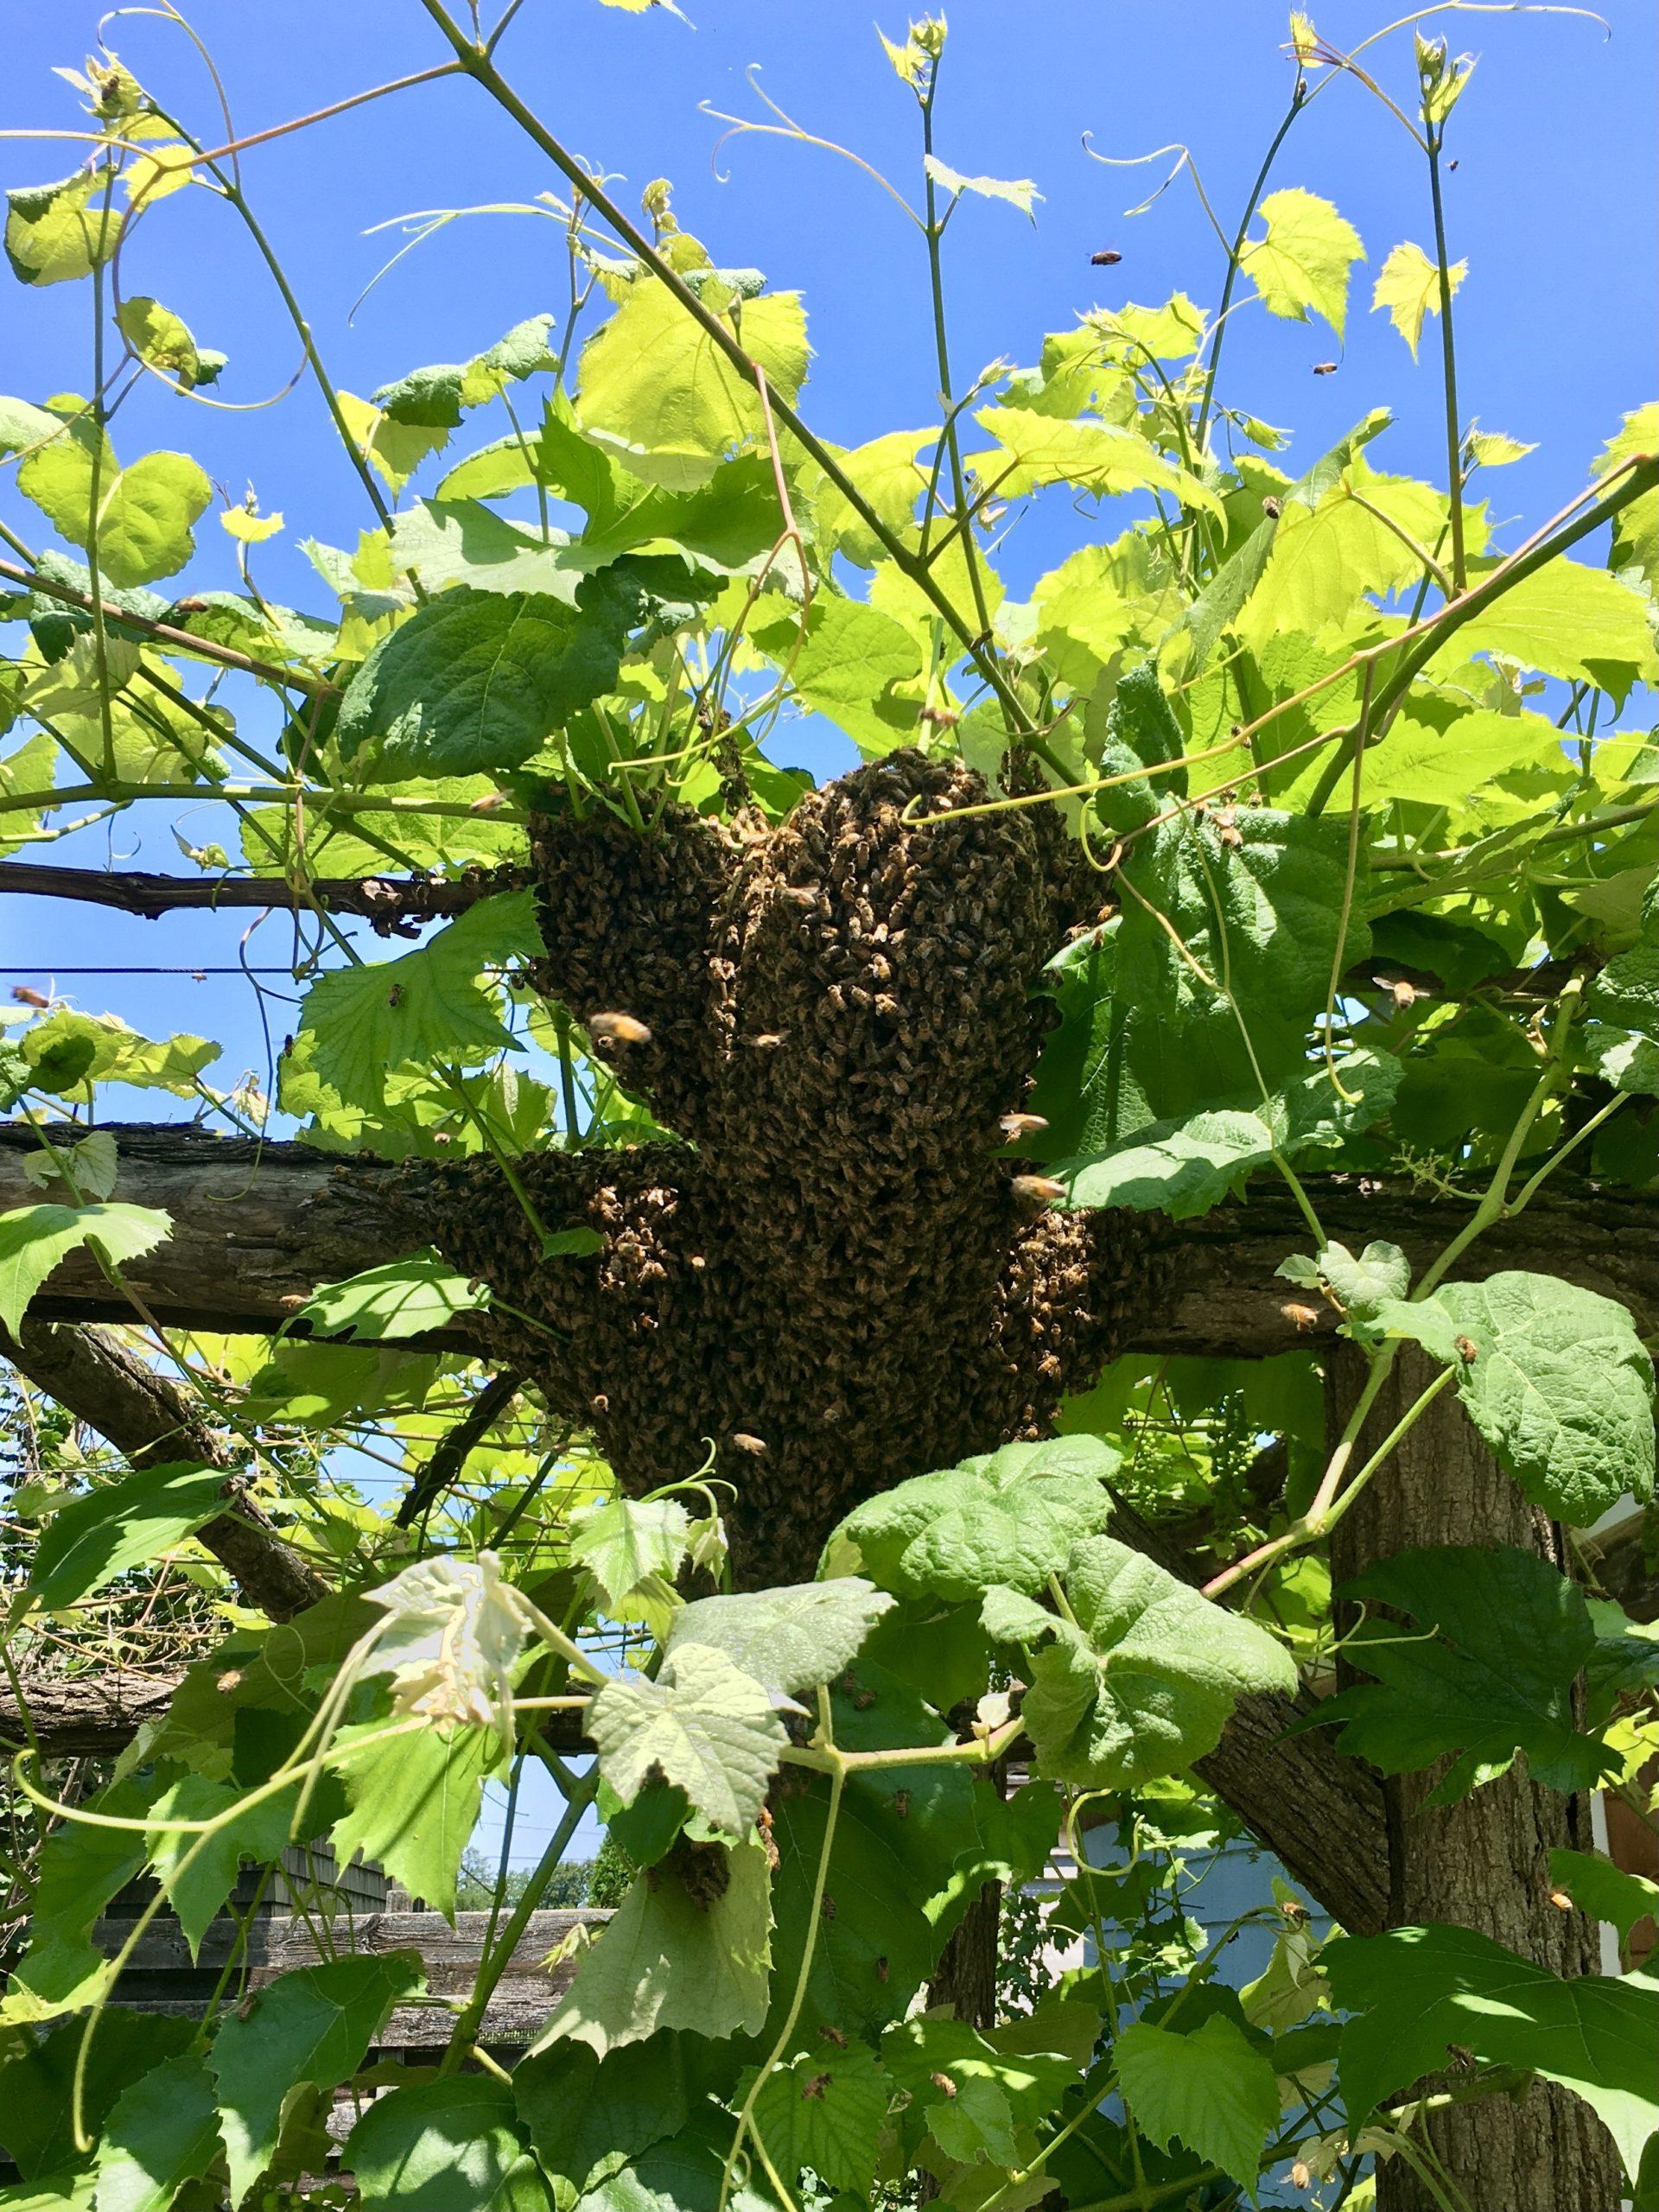 Swarm at Little Wren Farm